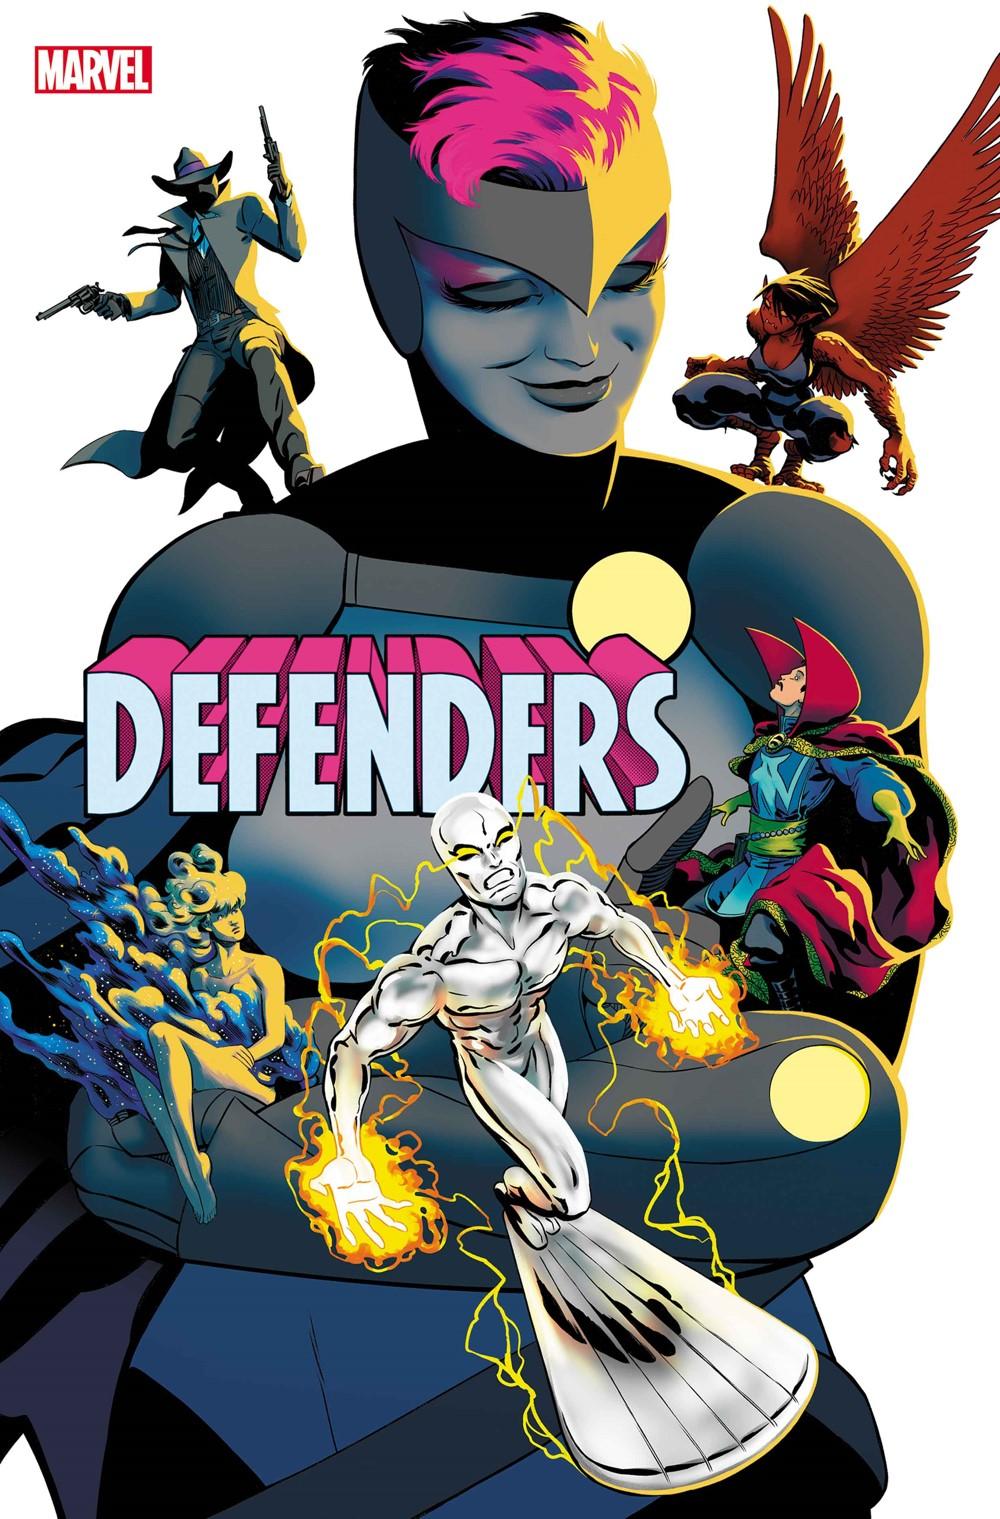 DEFENDERS2021002_cvr Marvel Comics September 2021 Solicitations